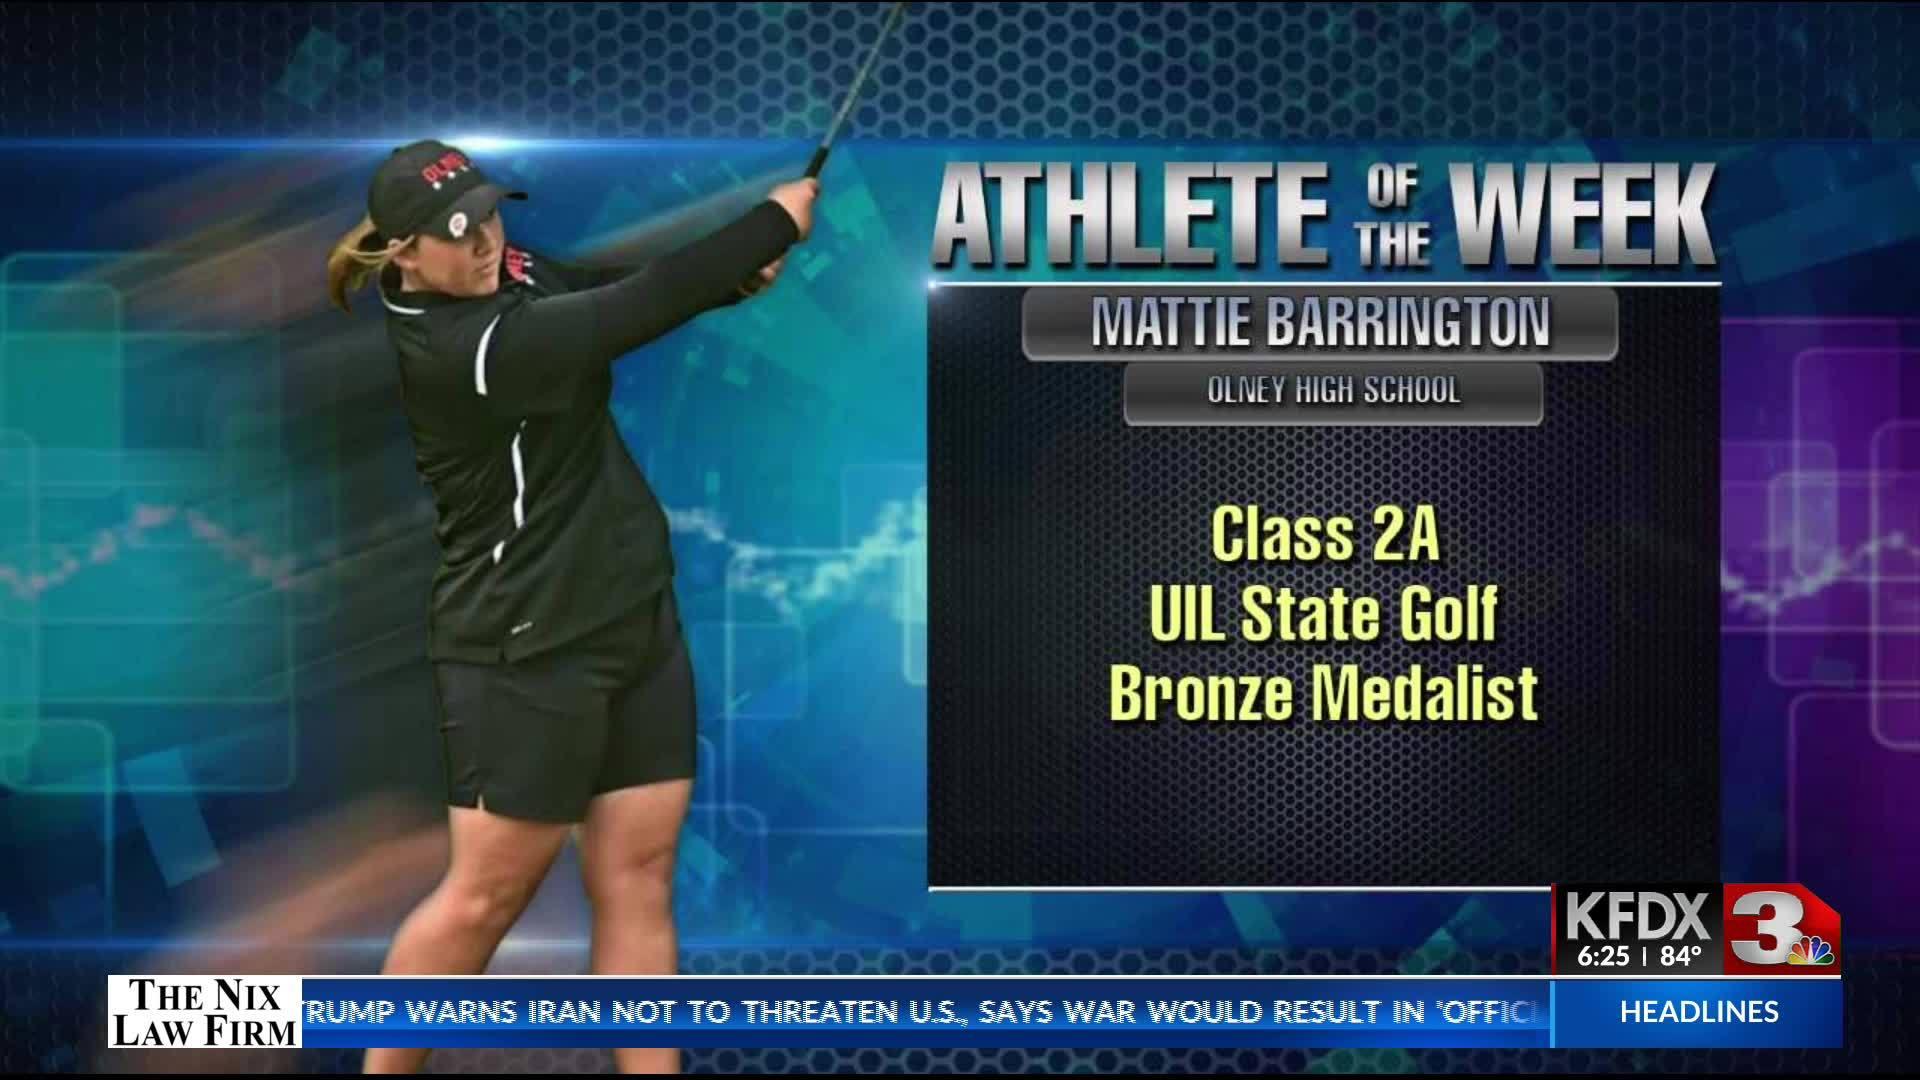 Athlete_of_the_Week__Mattie_Barrington___8_20190521013659